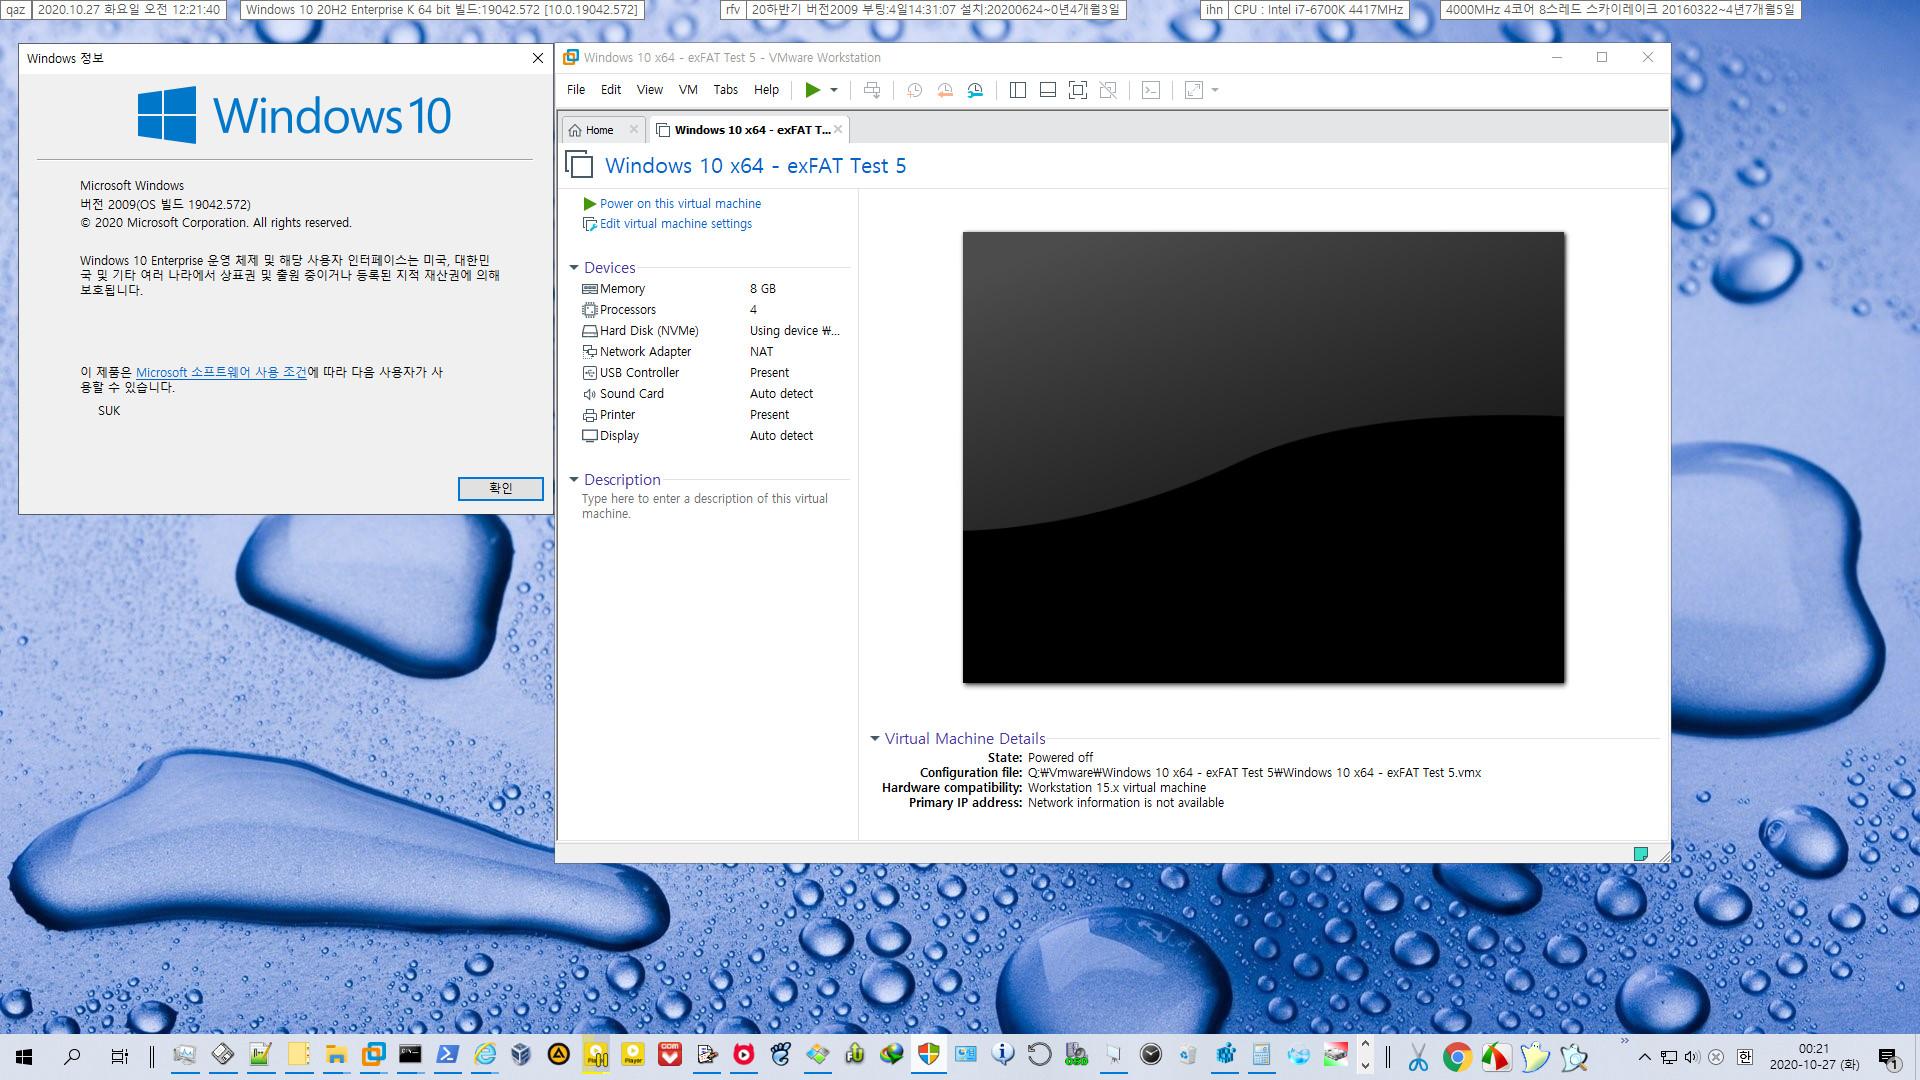 exFAT 포맷으로도 VHD 부팅이 Windows 10 버전 1903부터 된다고 하여 테스트 - 생고생만 하다가 컴퓨터 먹통 2번이나 되고 그만뒀습니다 2020-10-27_002140.jpg